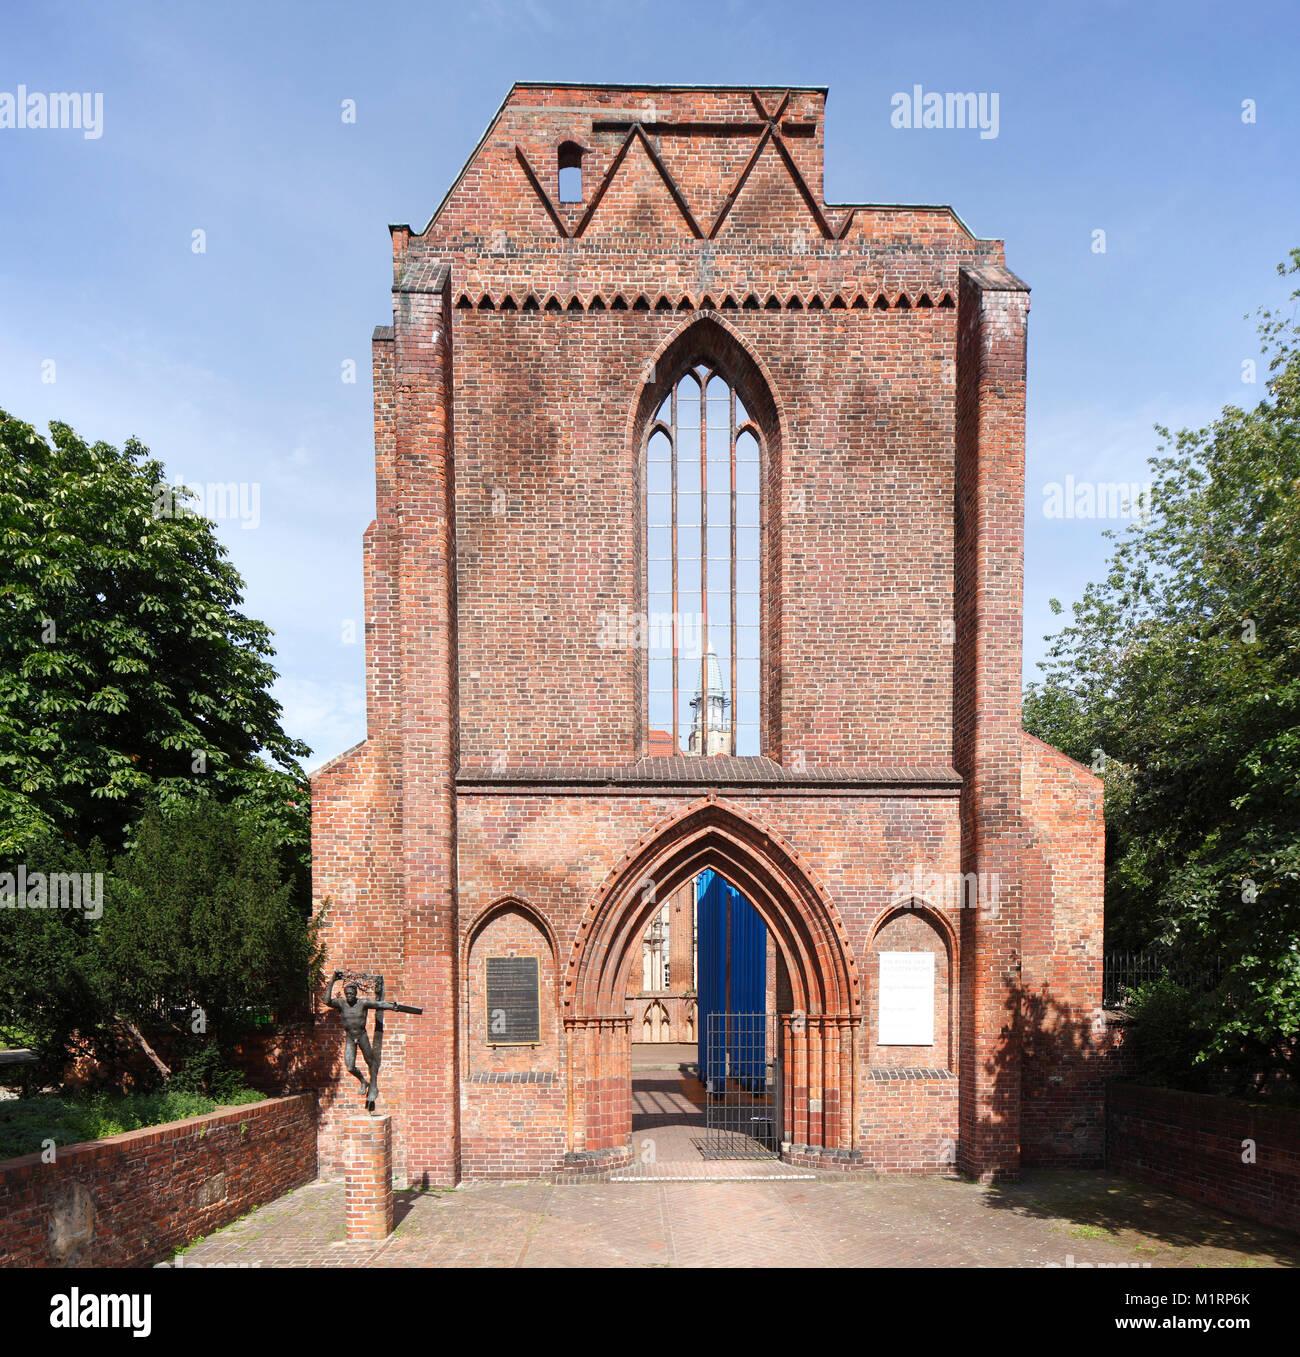 Franziskaner Klosterkirche, Klosterruine Berlin-Mitte, Berlin, Deutschland, Europa Stockbild